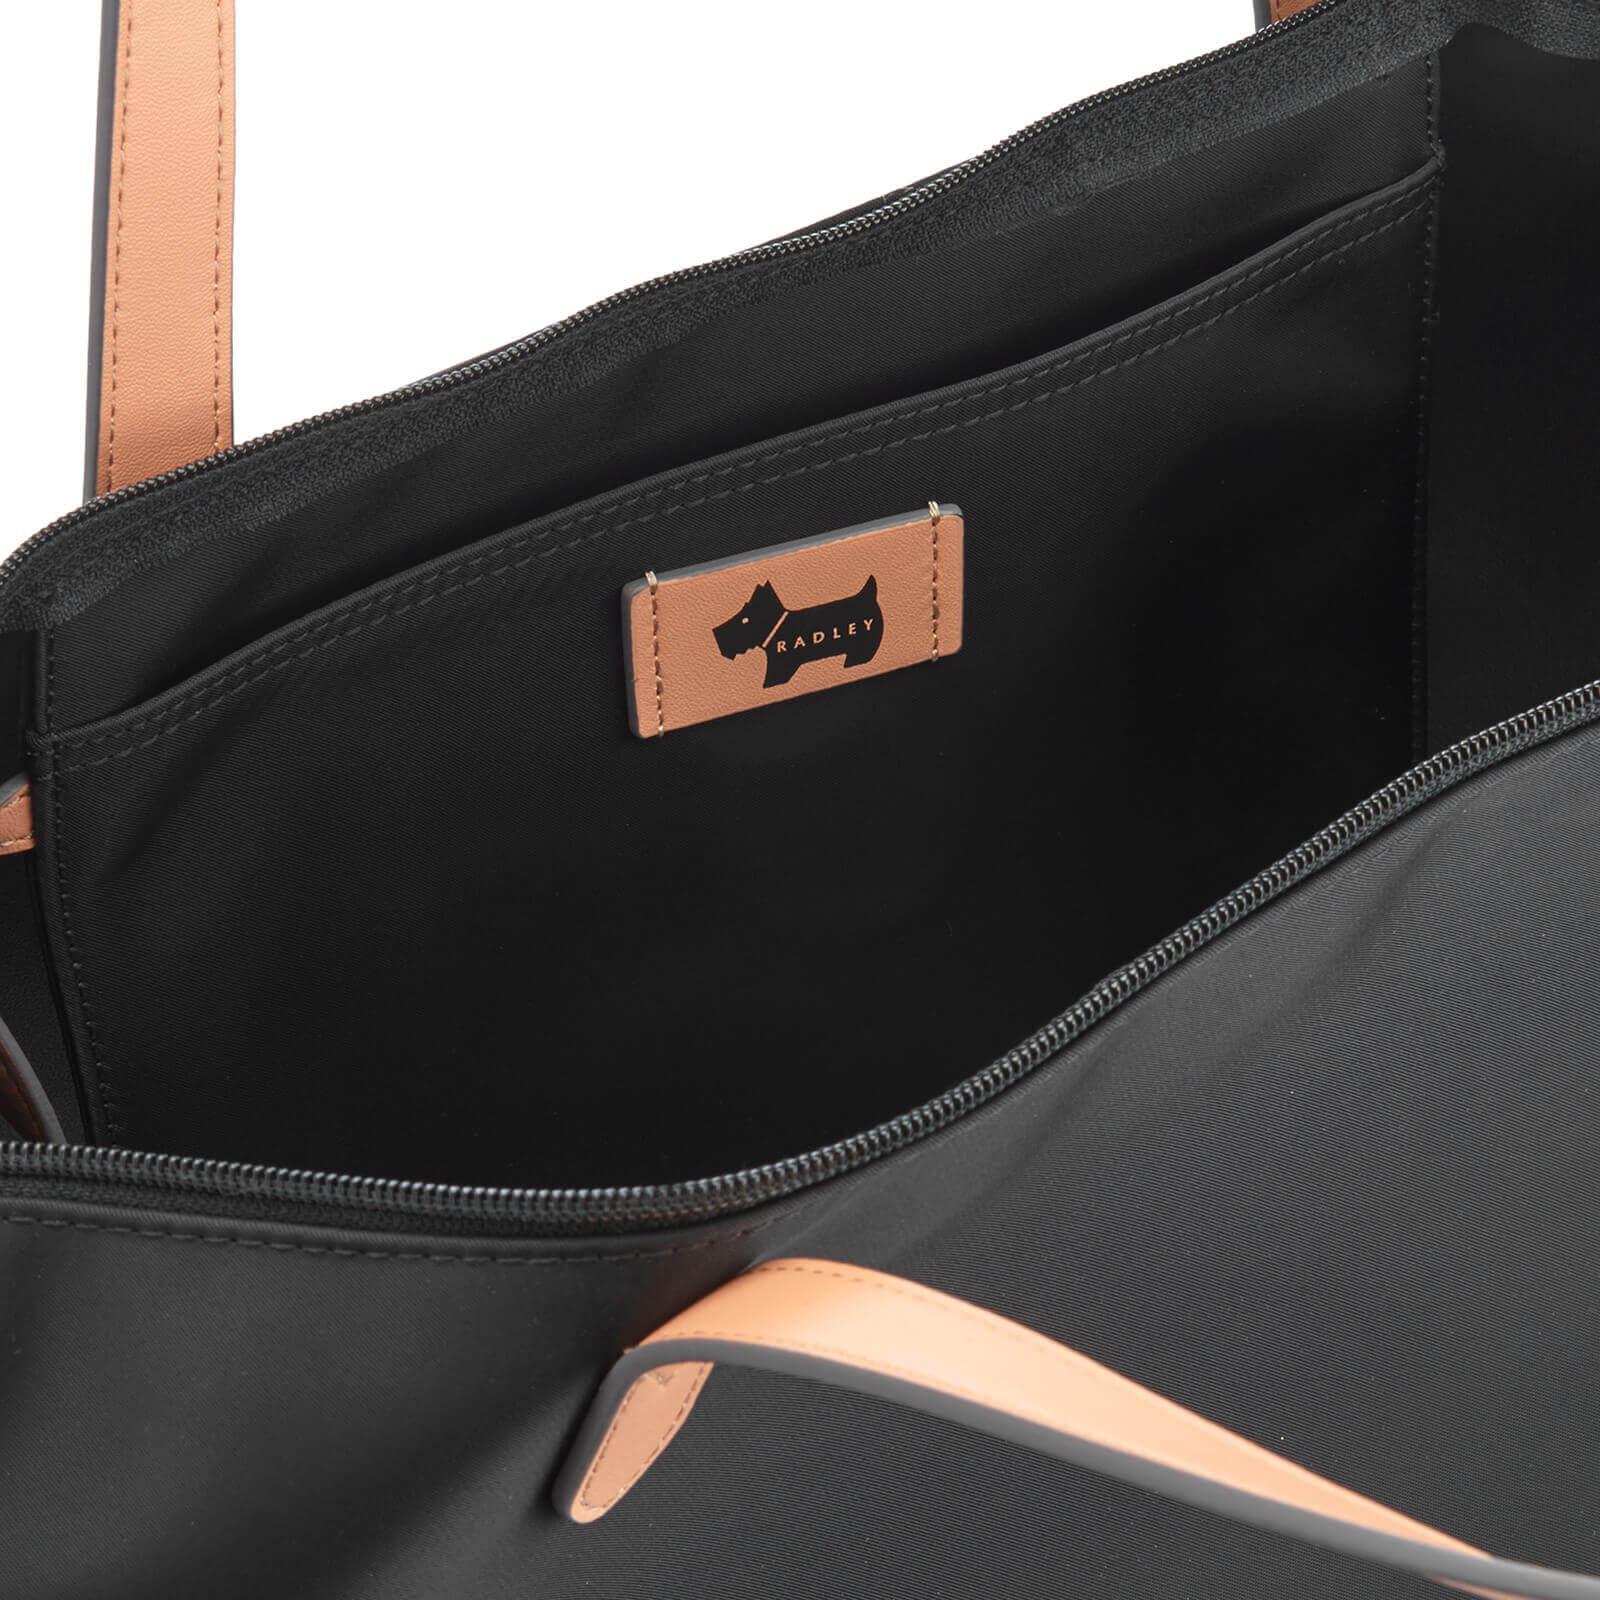 450218a042 Radley - Black Pocket Essentials Large Zip Top Tote Bag - Lyst. View  fullscreen